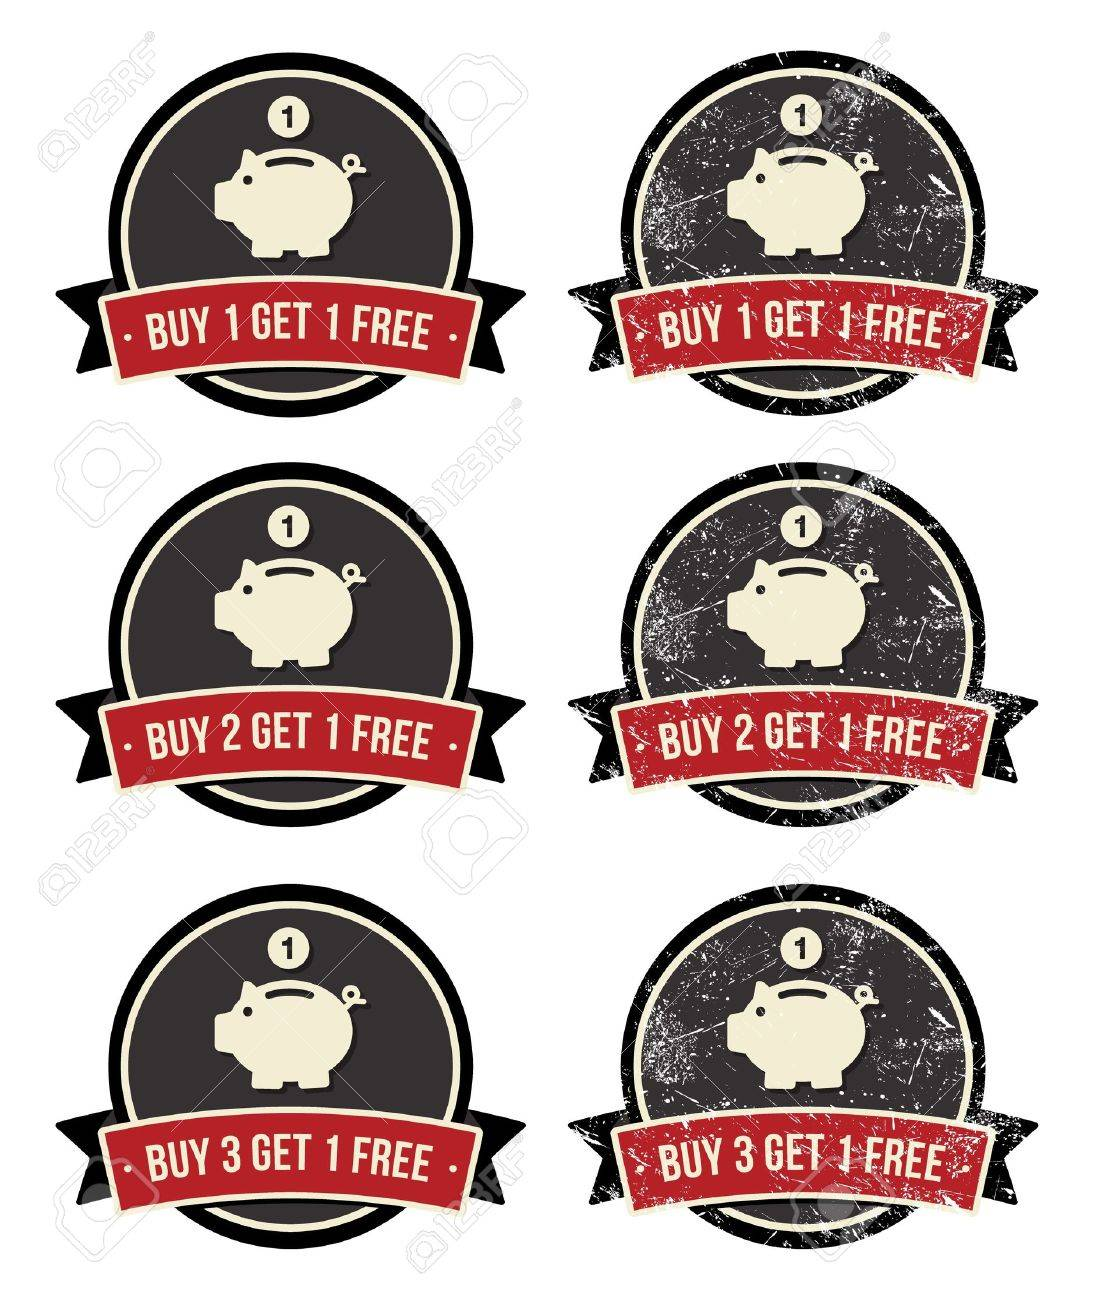 Buy 1 Get 1 Free retro grunge badges set Stock Vector - 14848864